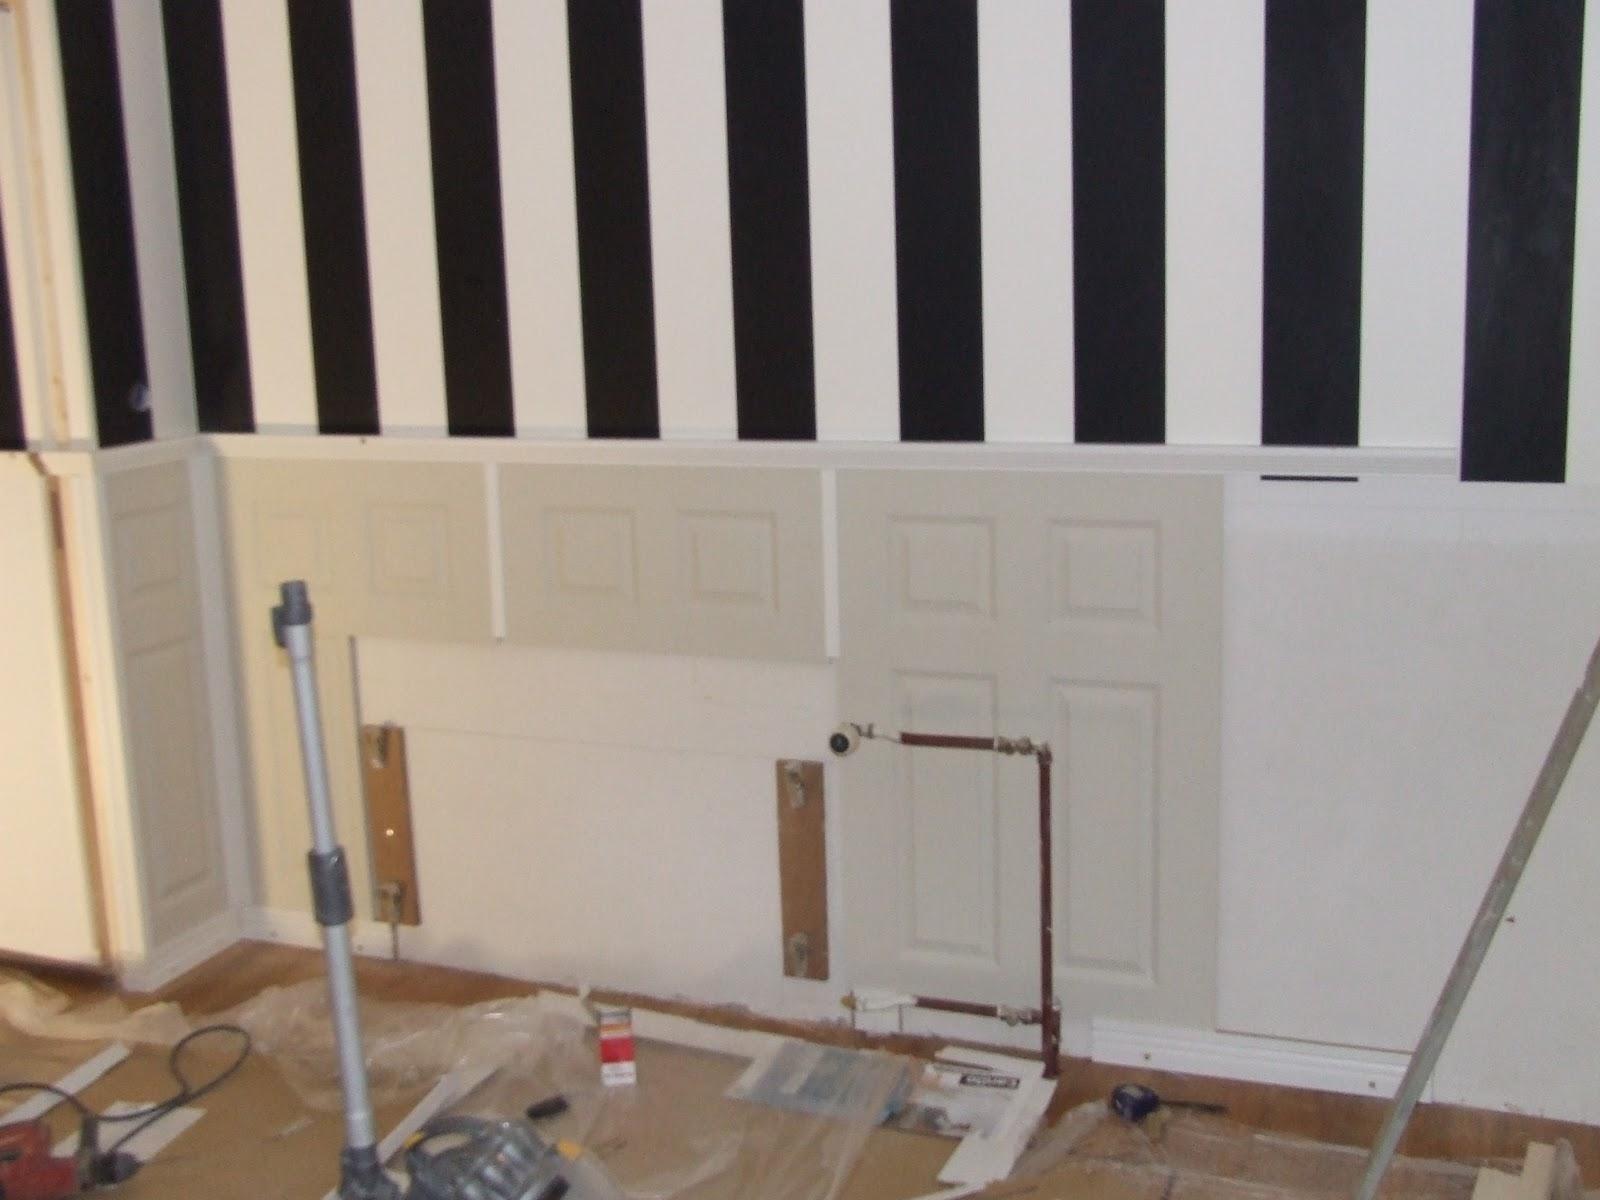 Lambrisering Op Badkamer : Wandbekleding badkamer alle materialen op een rijtje witte